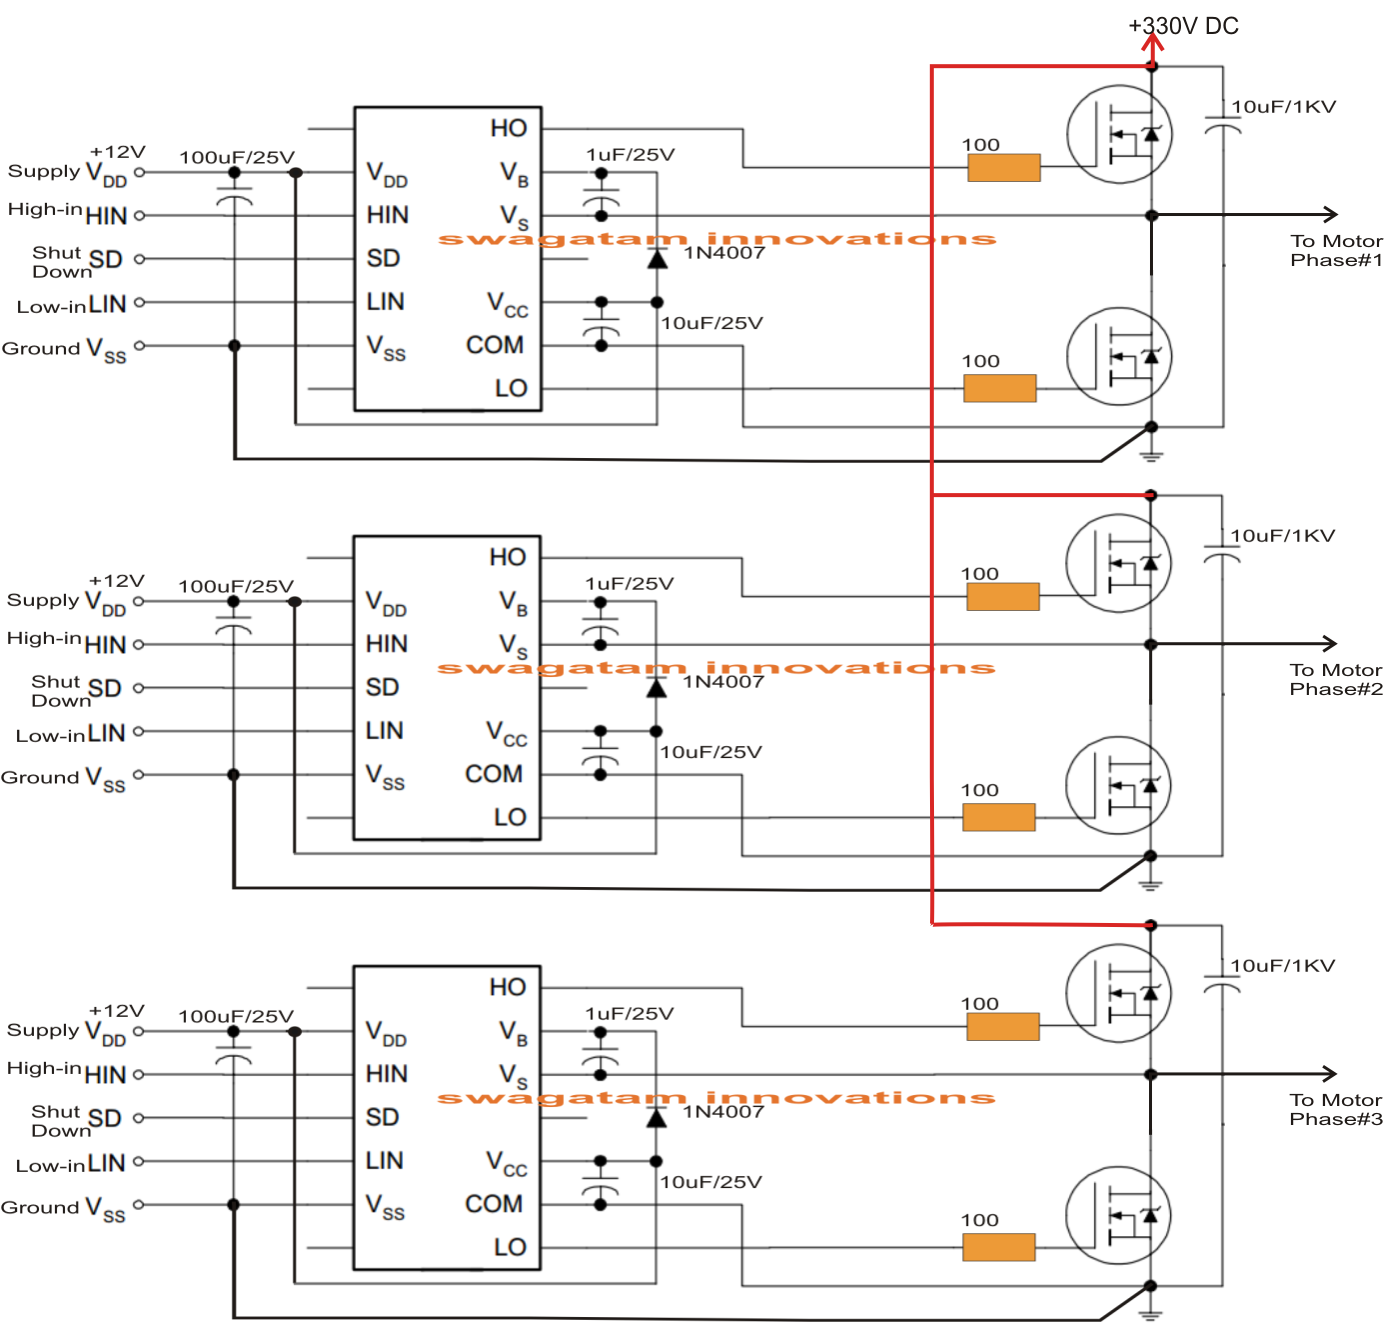 3 Phase Ups Wiring Diagram Circuit Detailed Skeletal System Three Inverter Centre